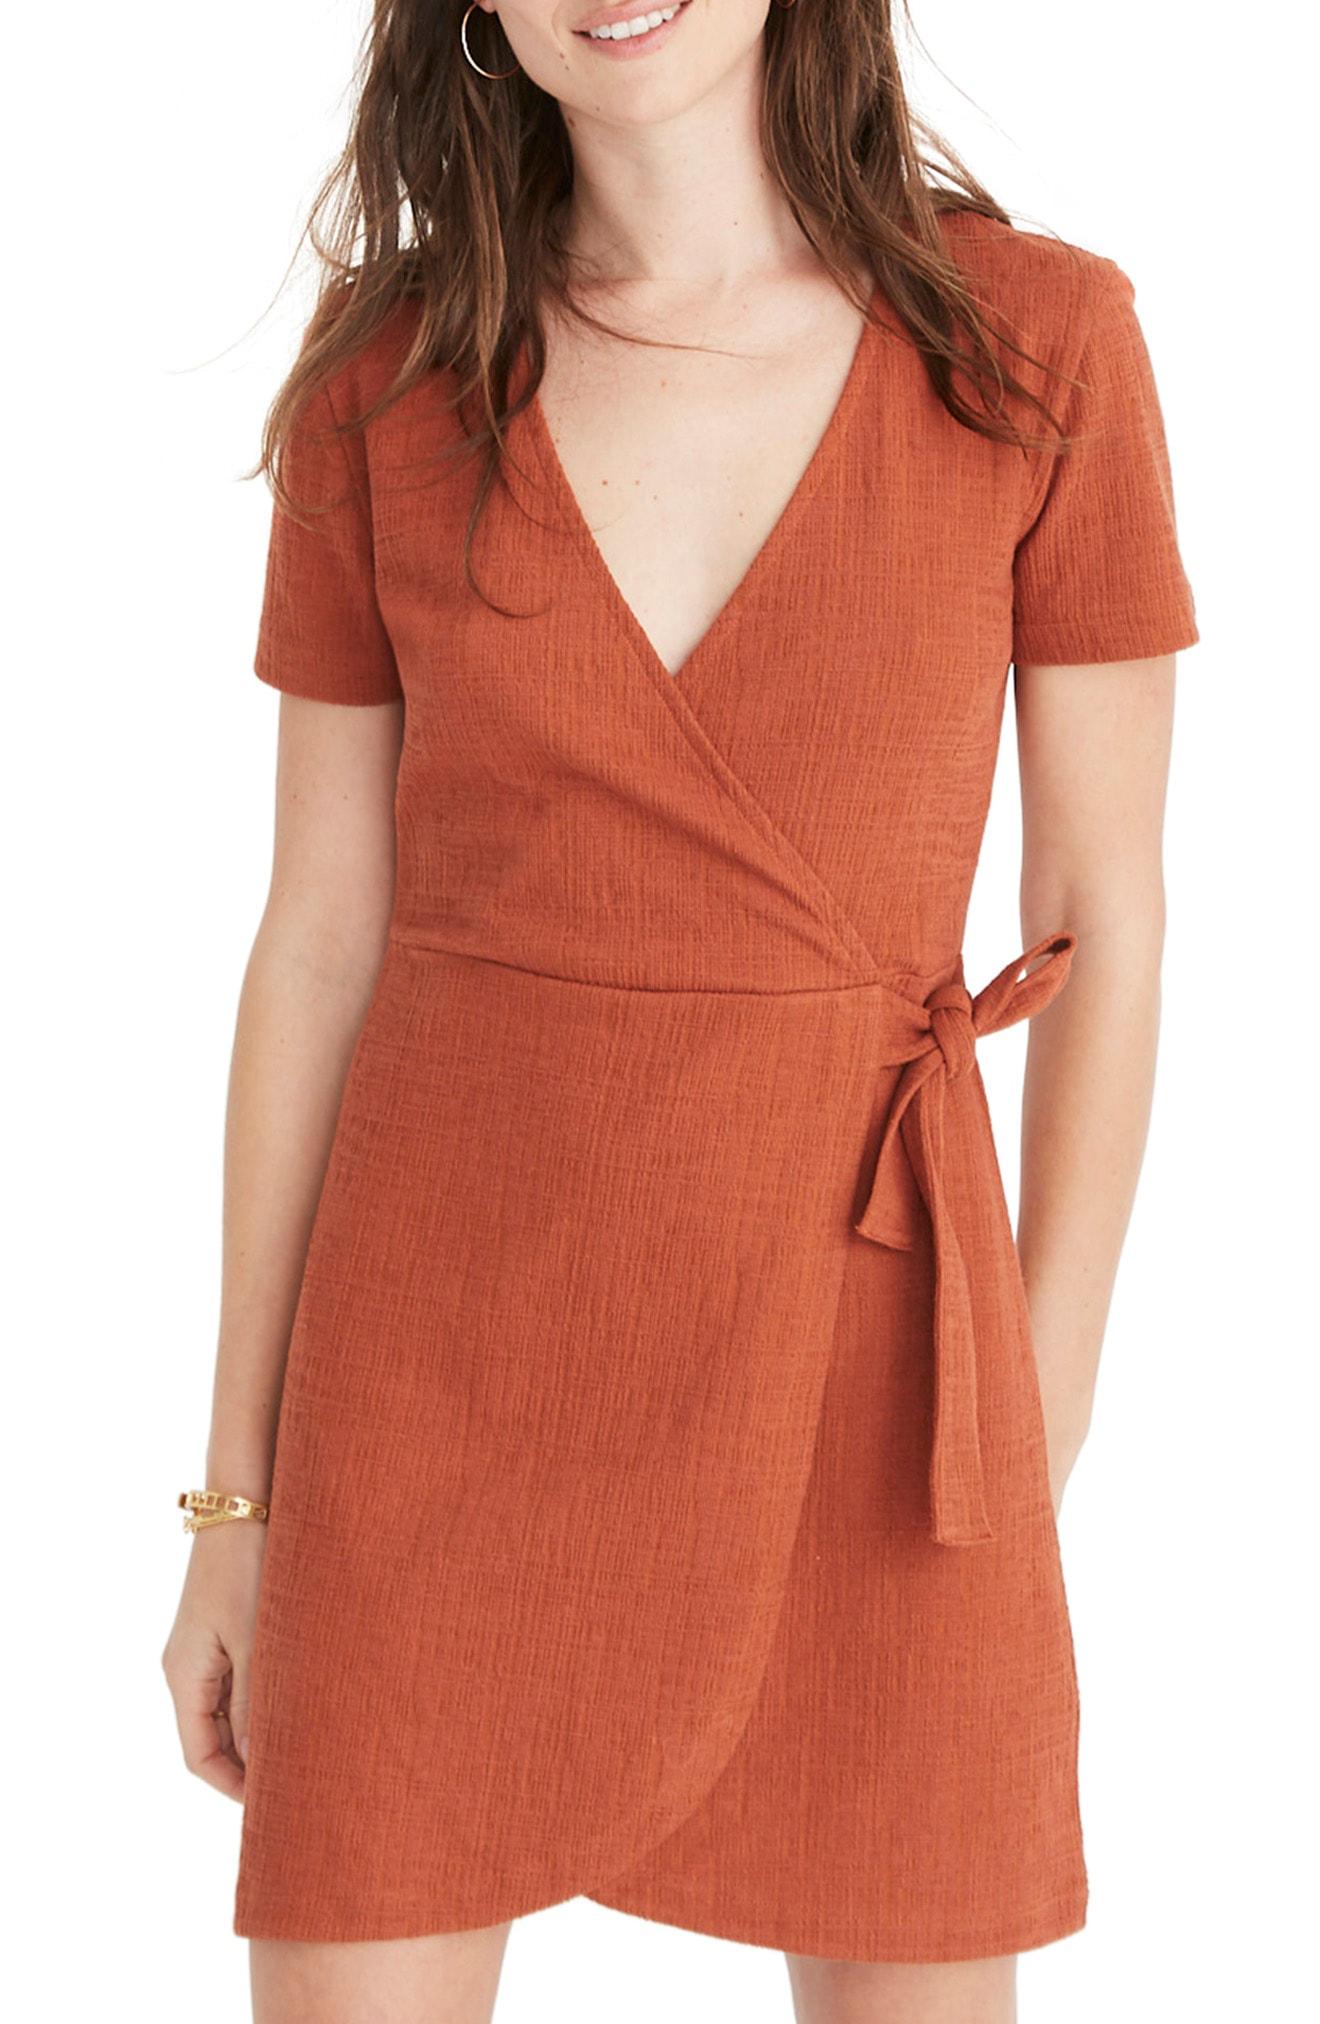 a3cdfff812 Madewell Texture   Thread Short Sleeve Side Tie Dress In Burnt Clay ...